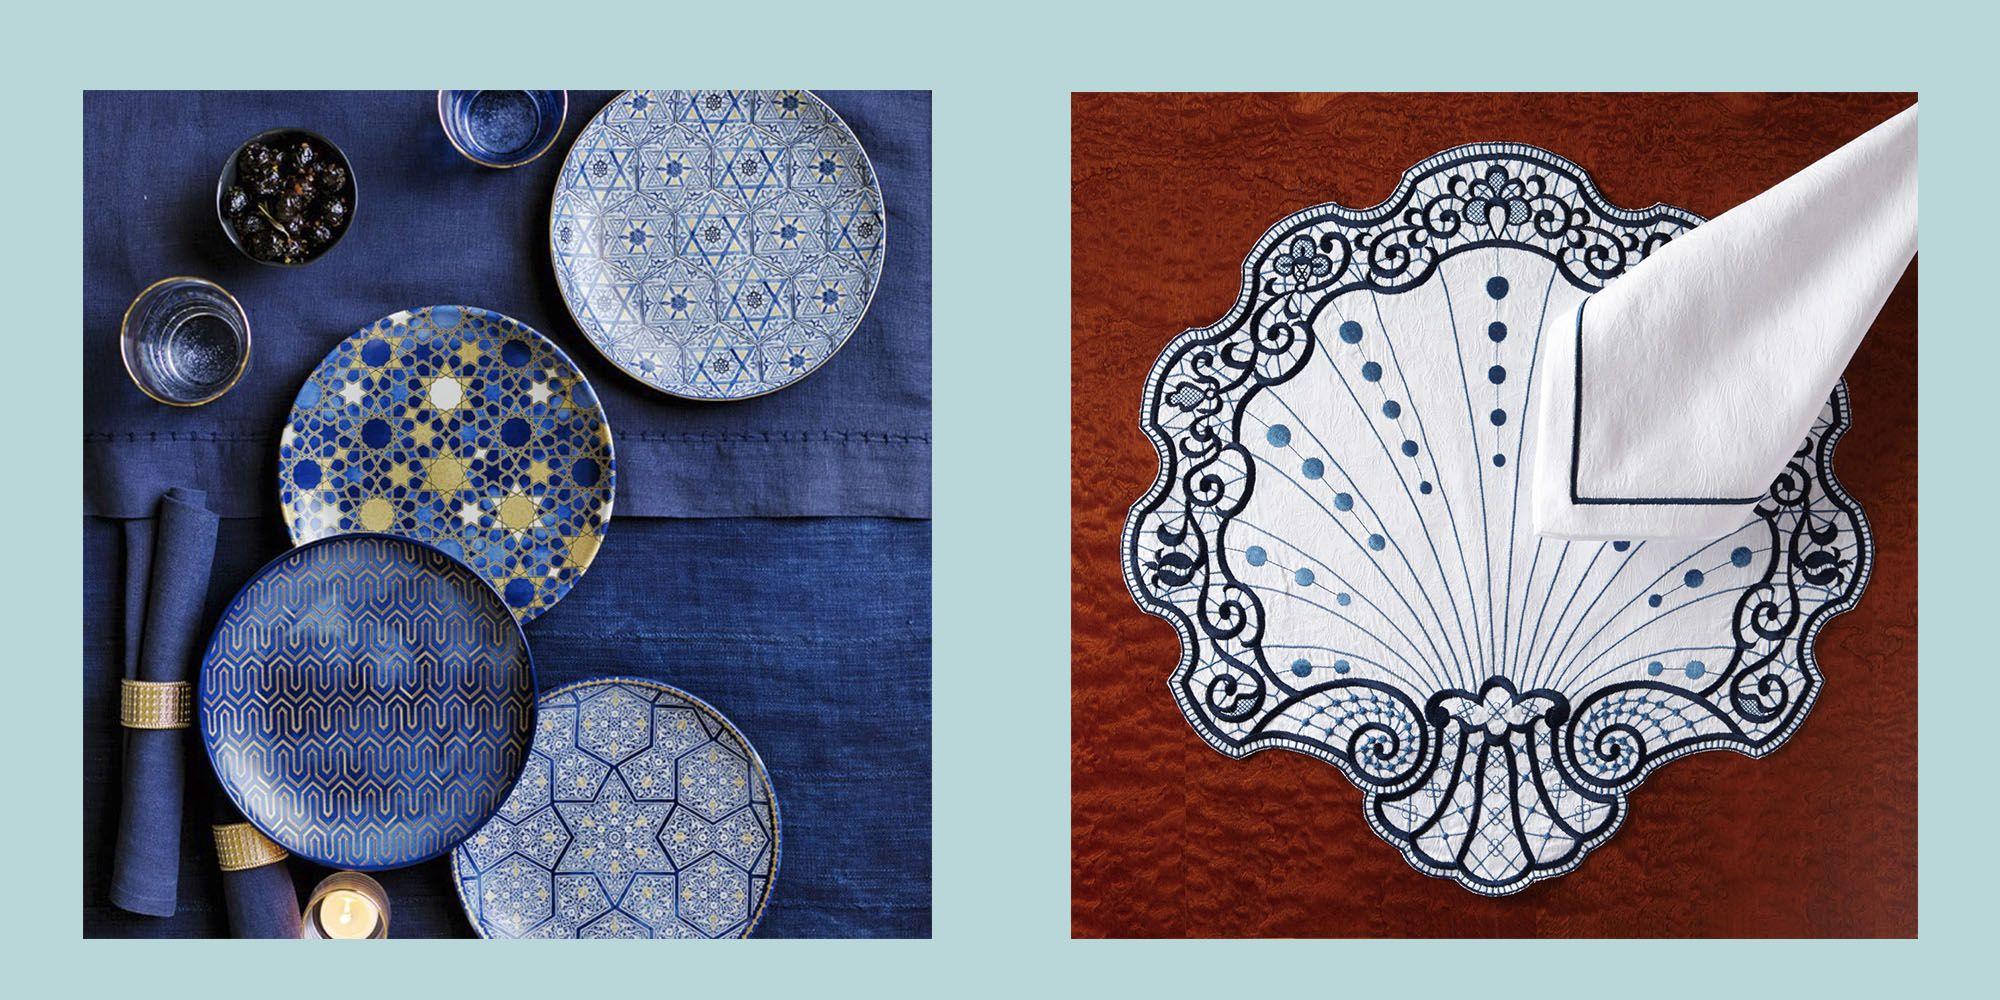 Hanukkah Table Decoration Ideas , How to Decorate for Hanukkah